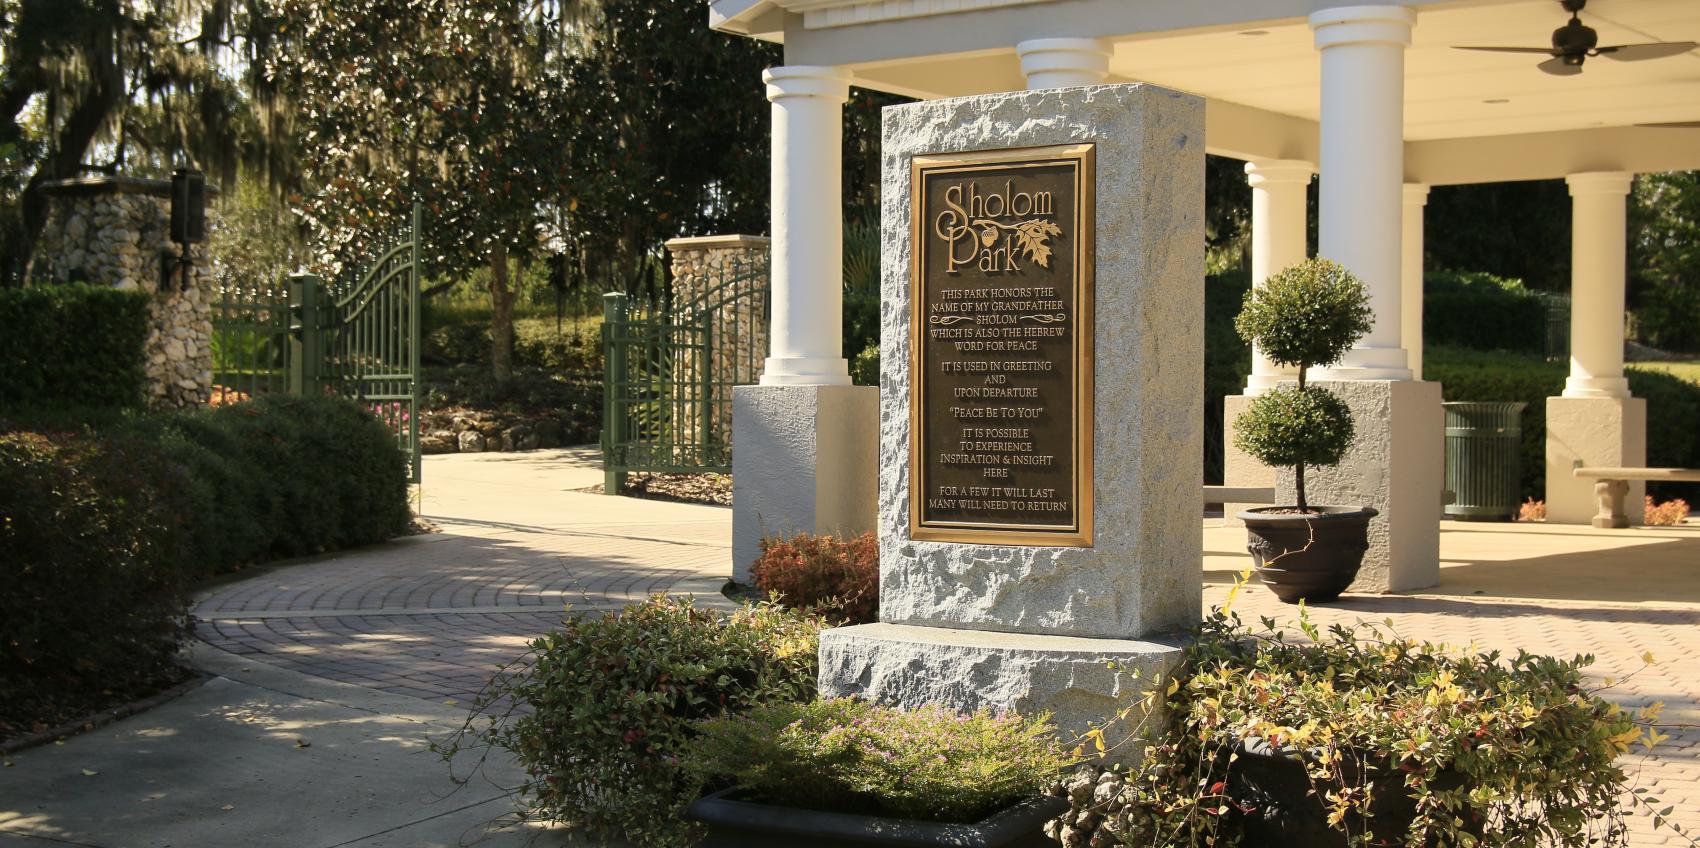 Sholom Park | American Public Gardens Association